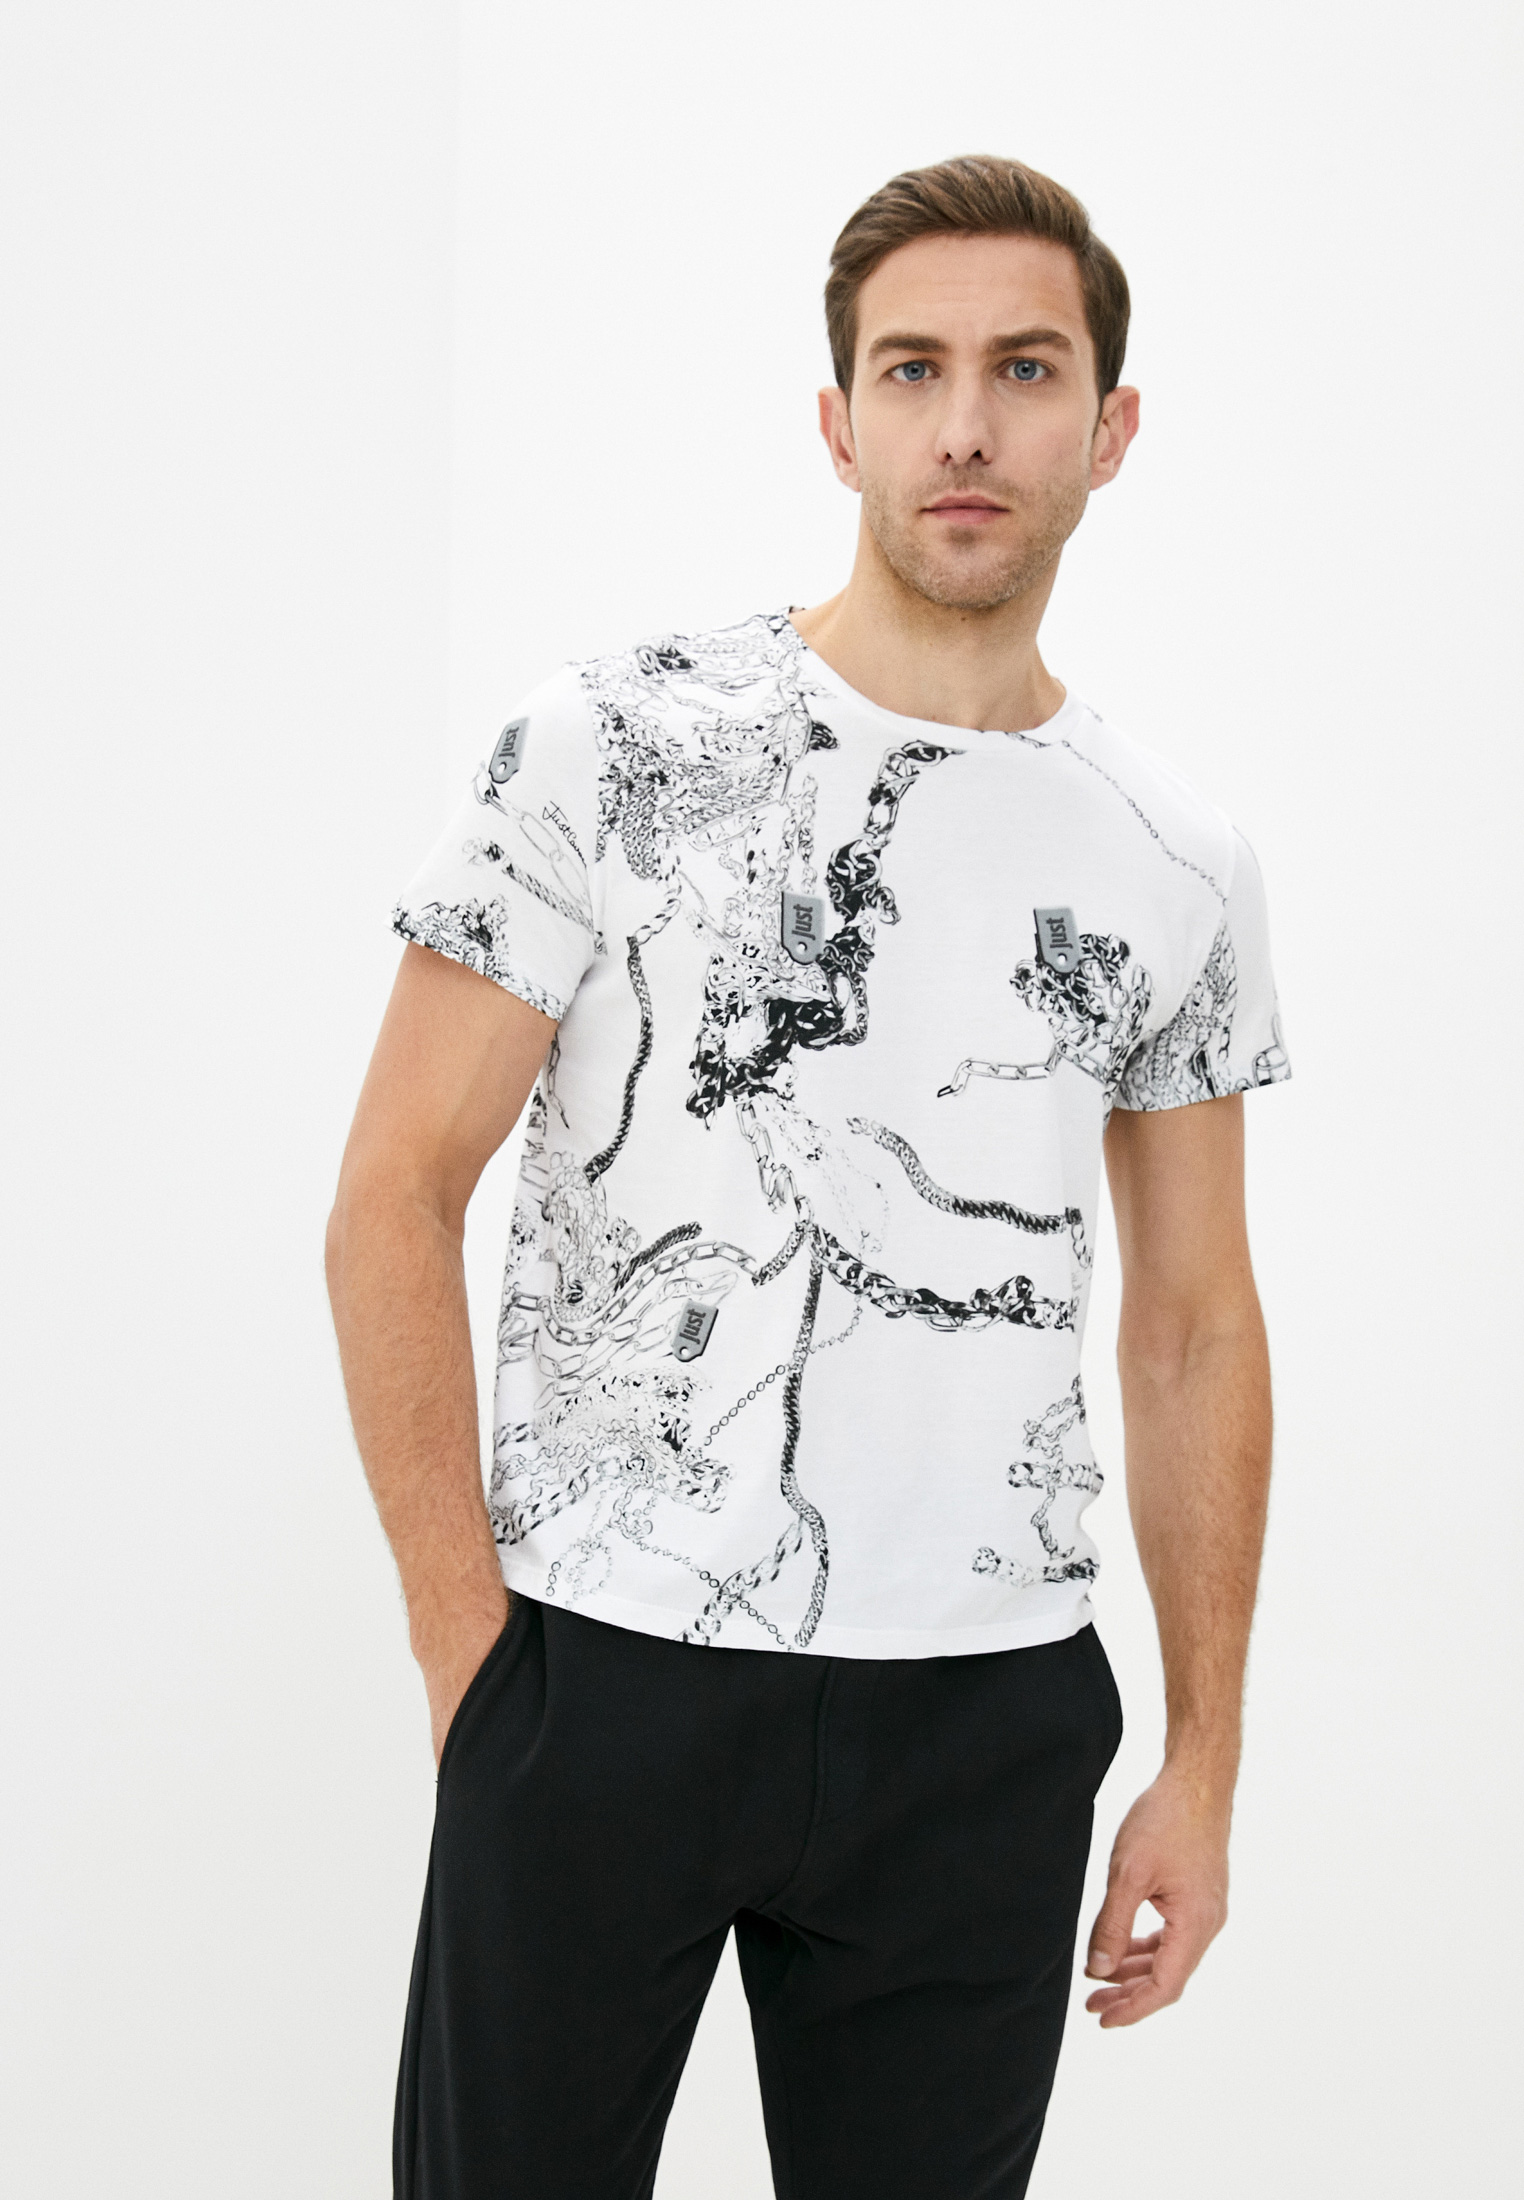 Мужская футболка Just Cavalli (Джаст Кавалли) S01GC0570 N21427